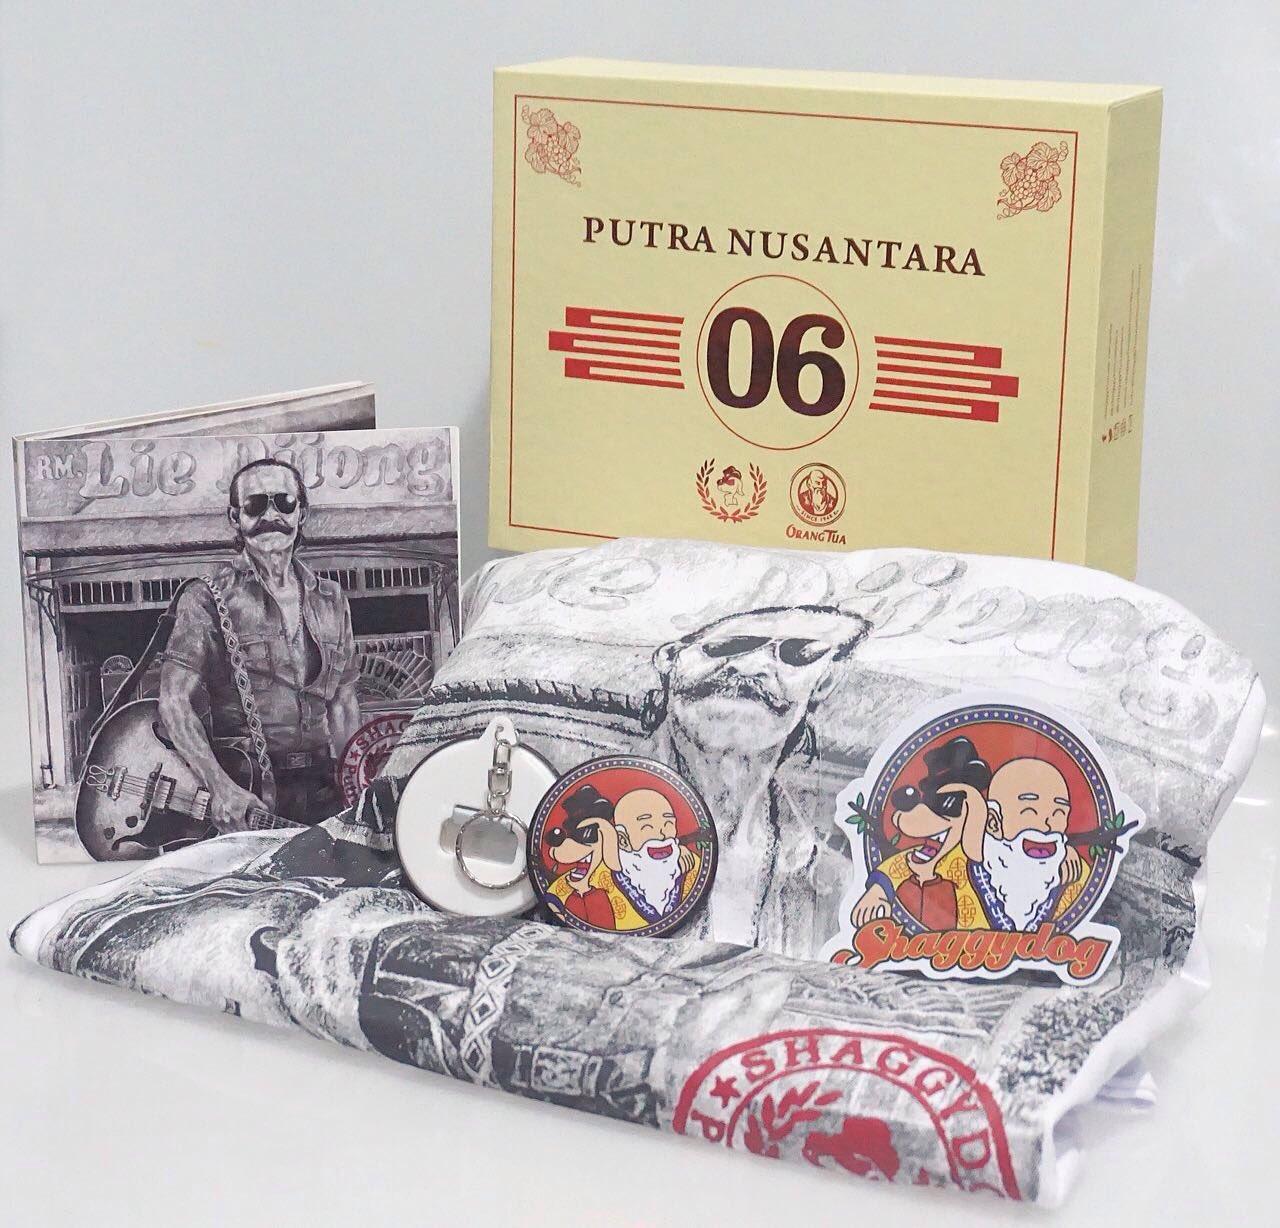 Boxset Album Putra Nusantara Shaggydog